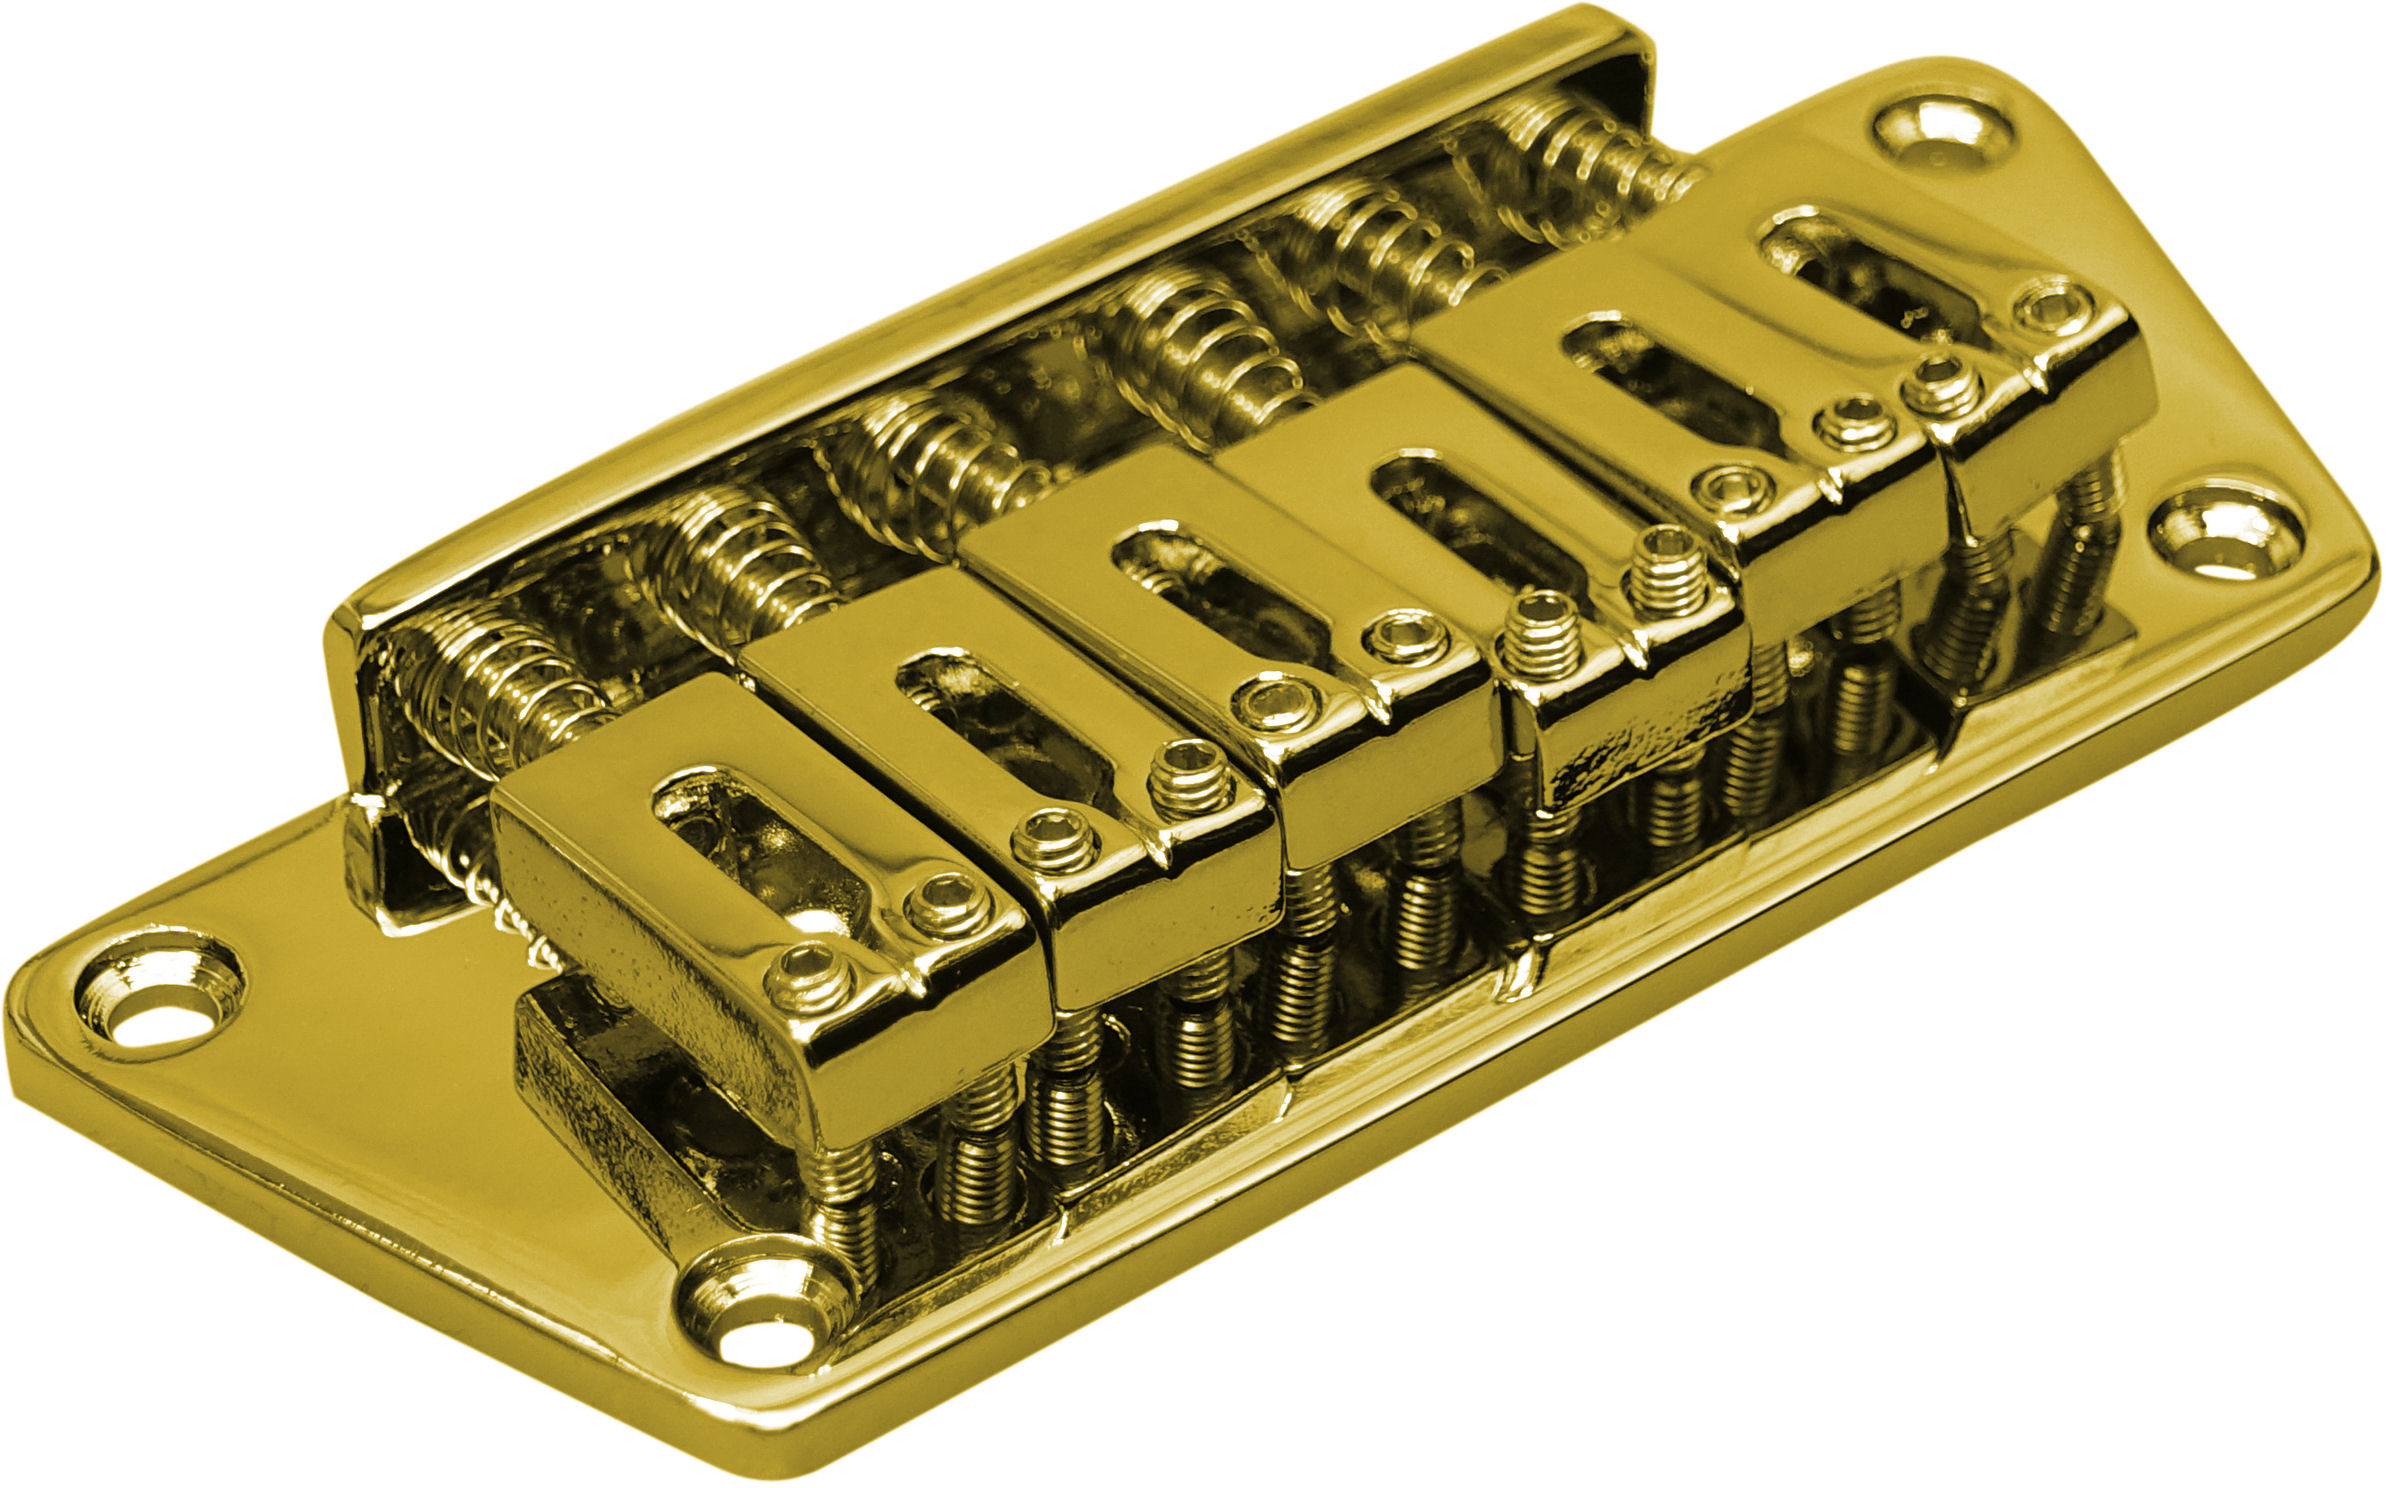 Toronzo Bridge ST-HTTR-Gold